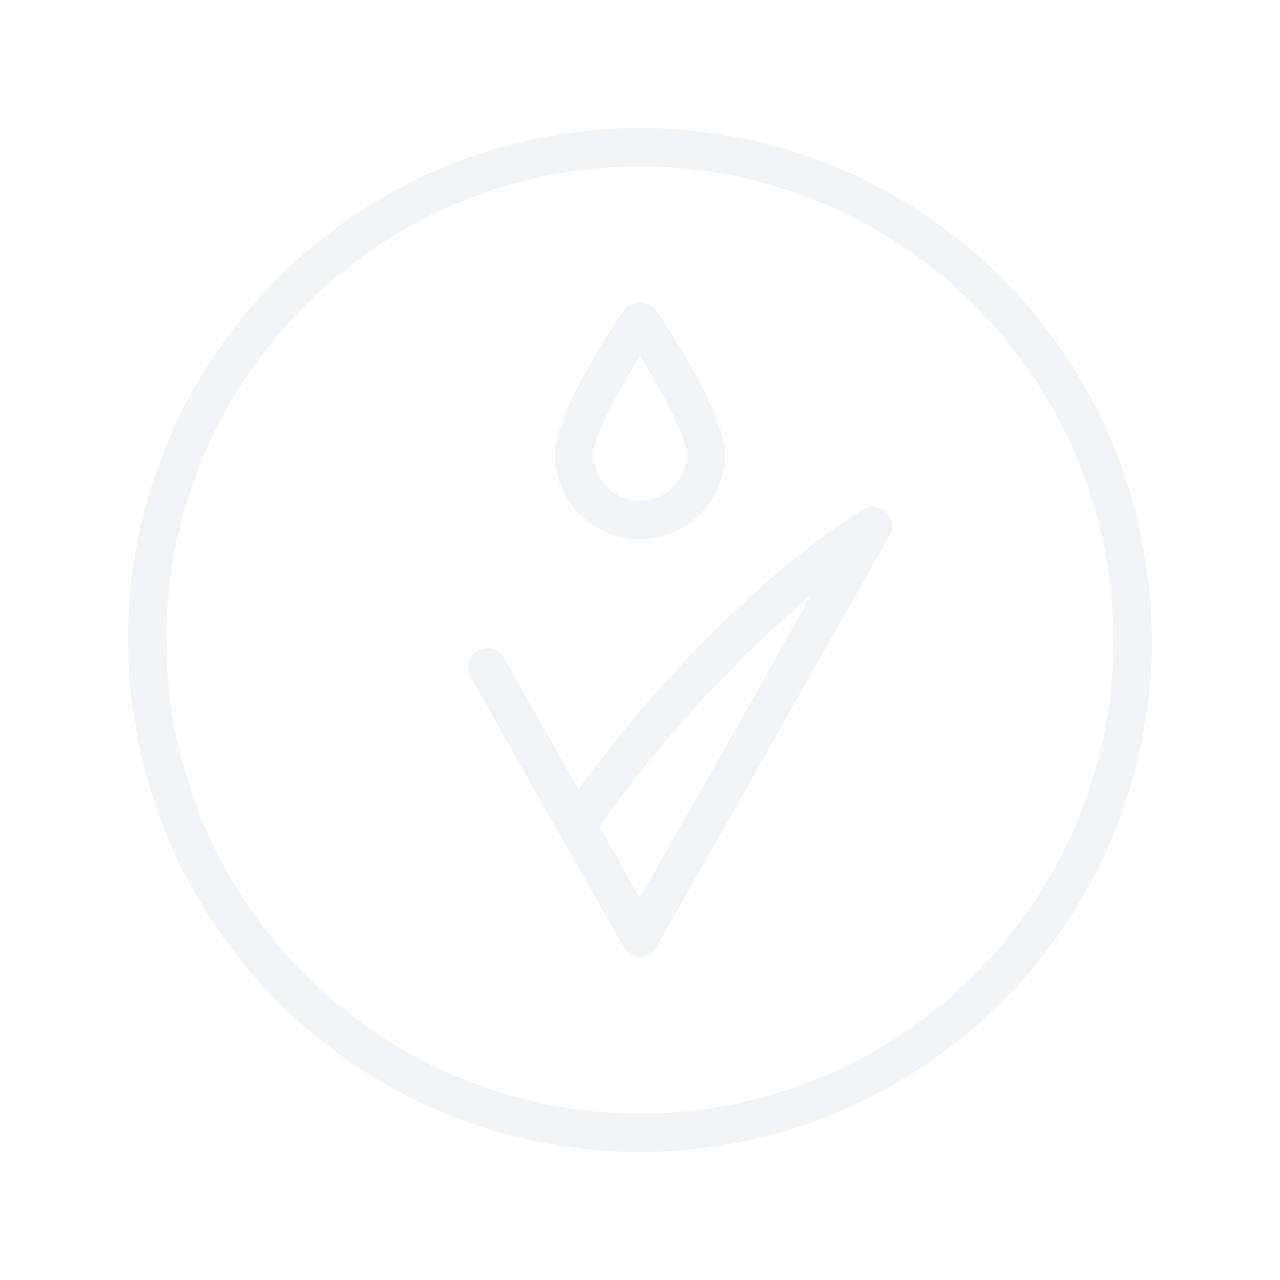 Yves Saint Laurent Mascara Volume Effet Faux Cils No.4 Fascinating Violet 7.5ml